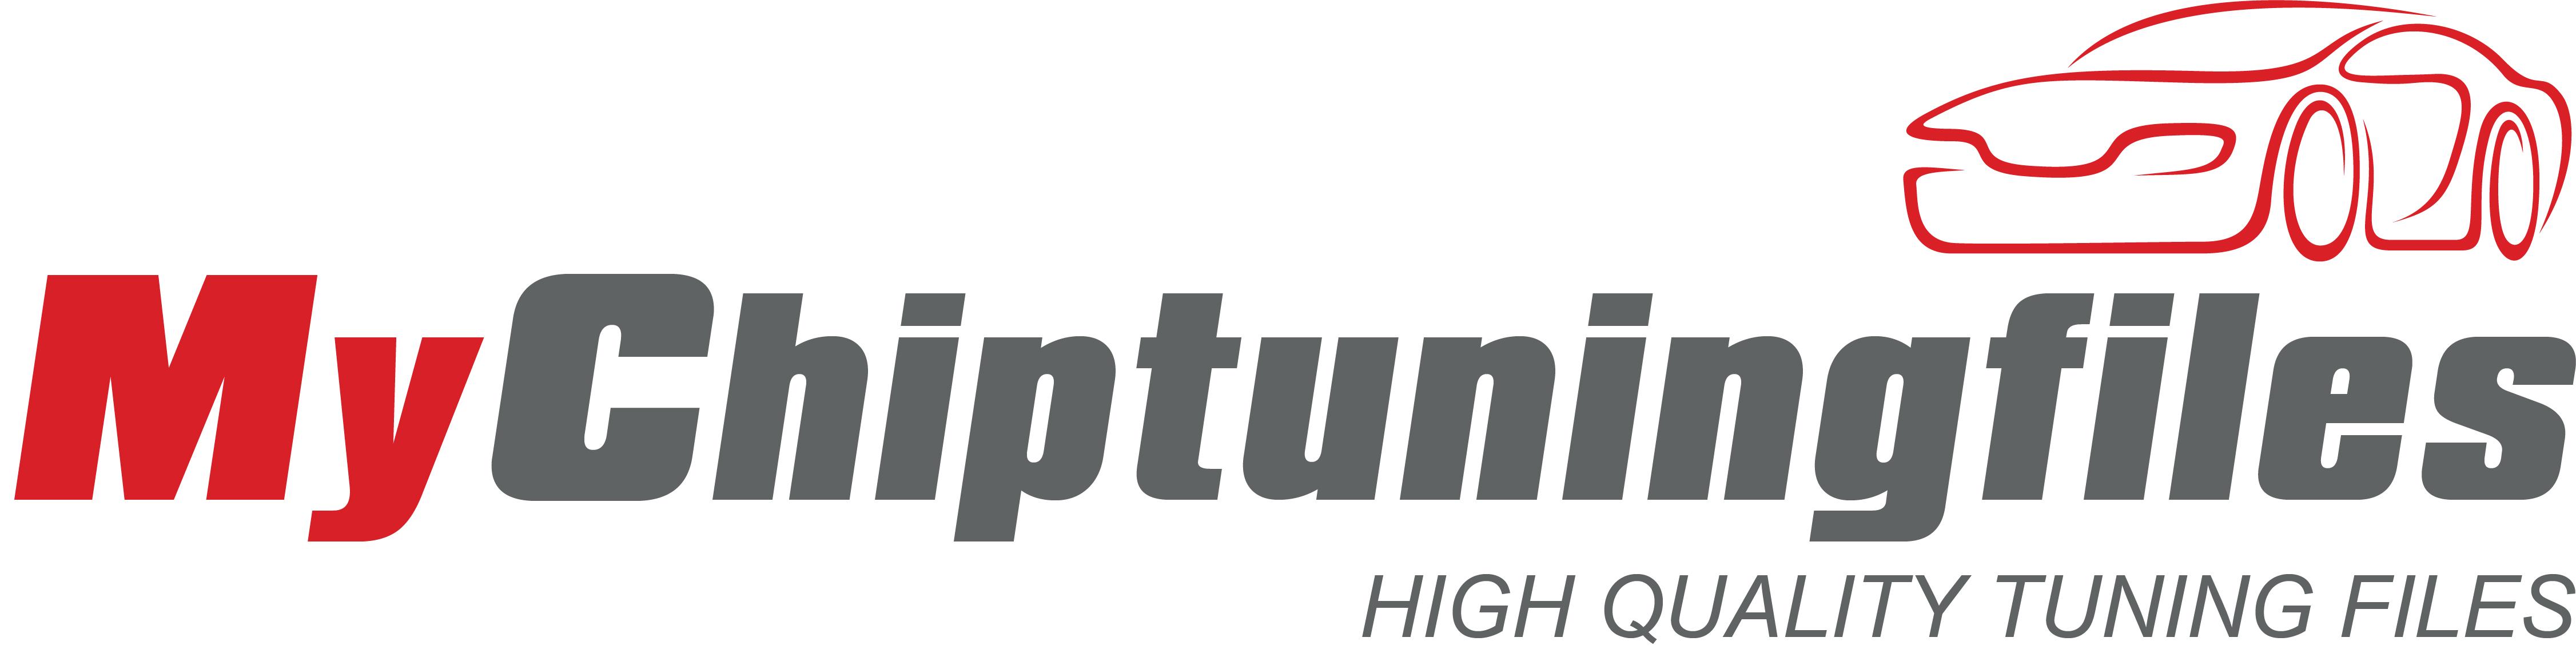 My Chiptuningfiles logo